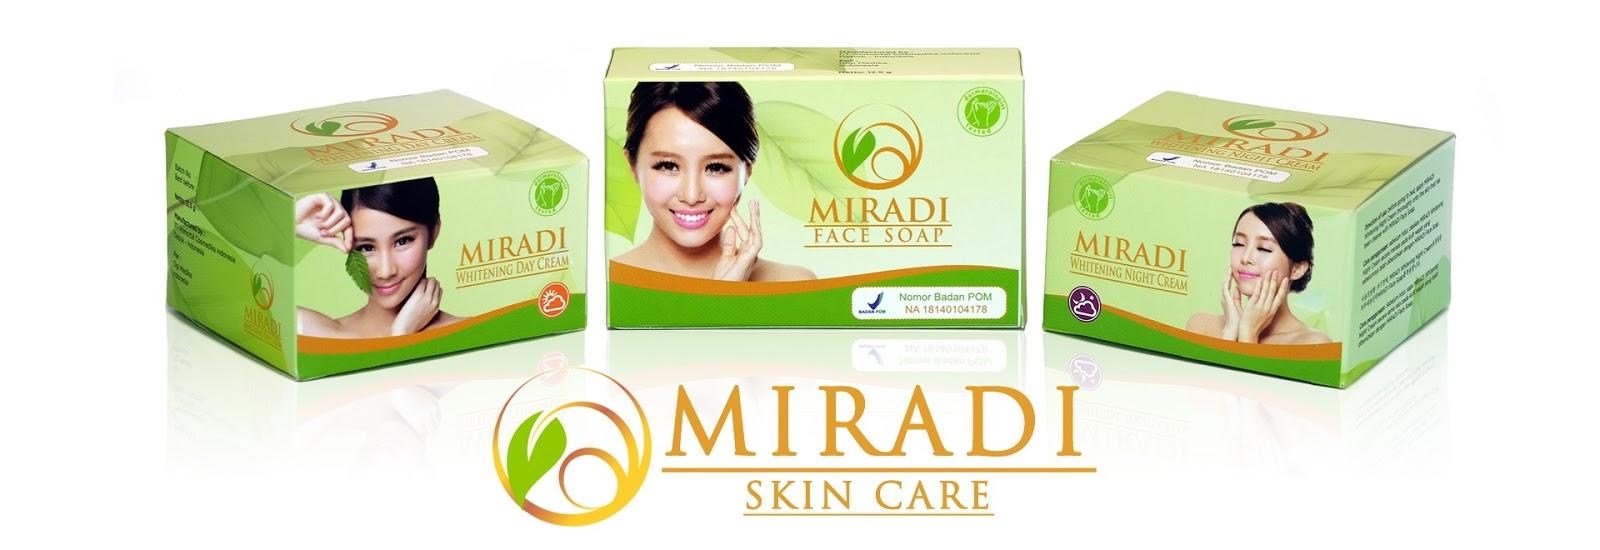 Miradi Skin Care